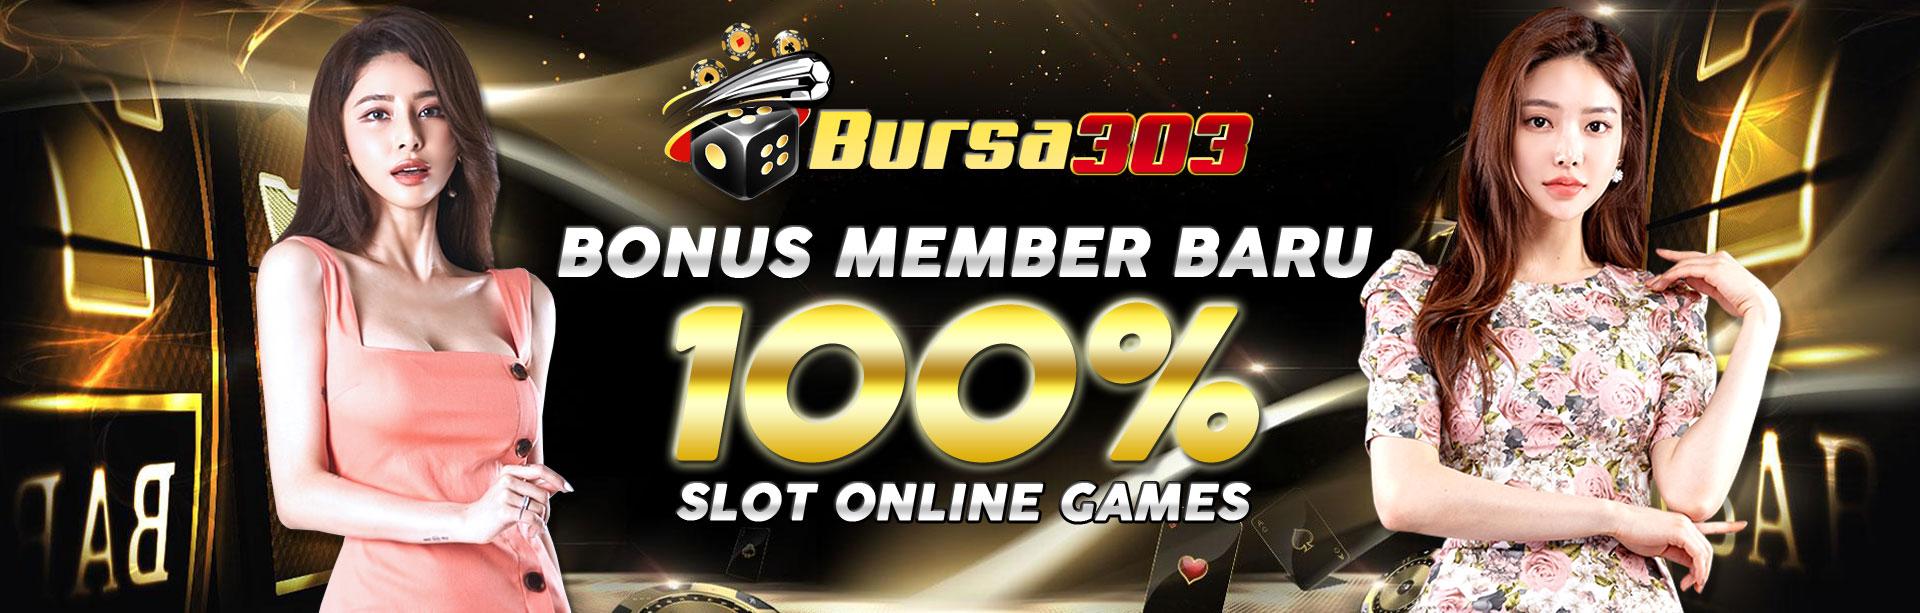 bonus 100% judi slot online